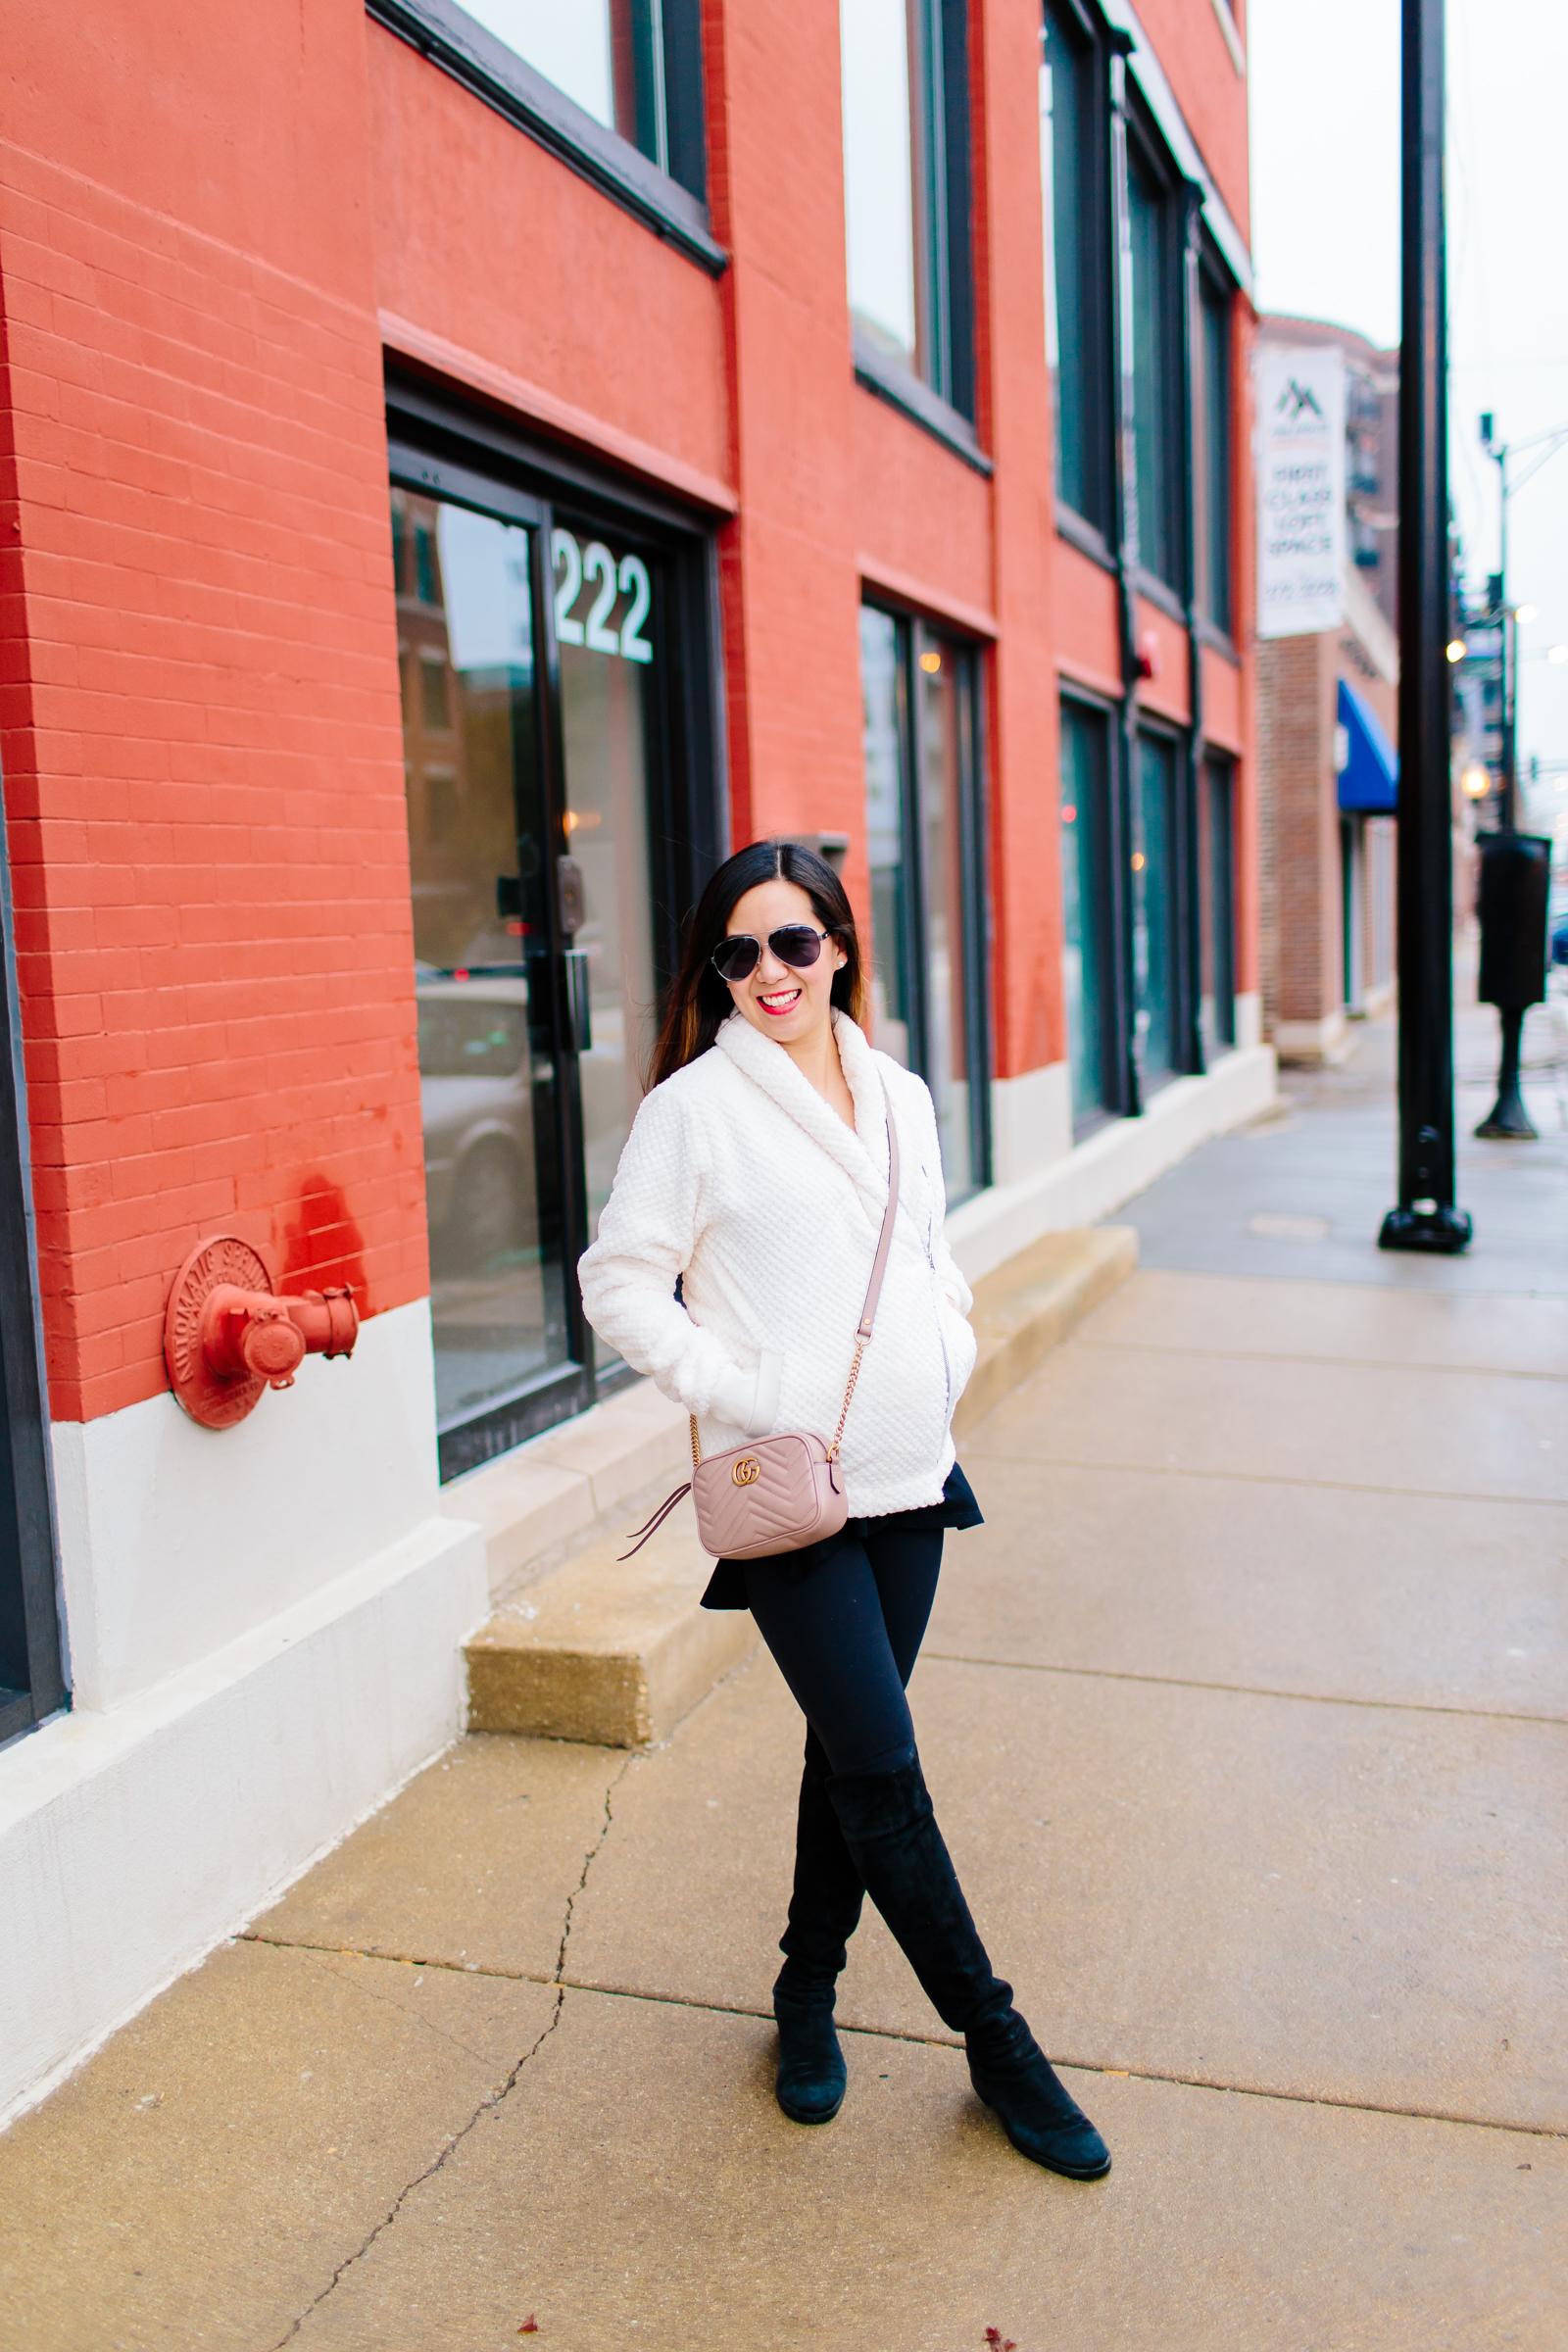 Zella Fleece + Gucci Marmont Matelasse Shoulder Bag, Tia Perciballi Fashion & Lifestyle Blog